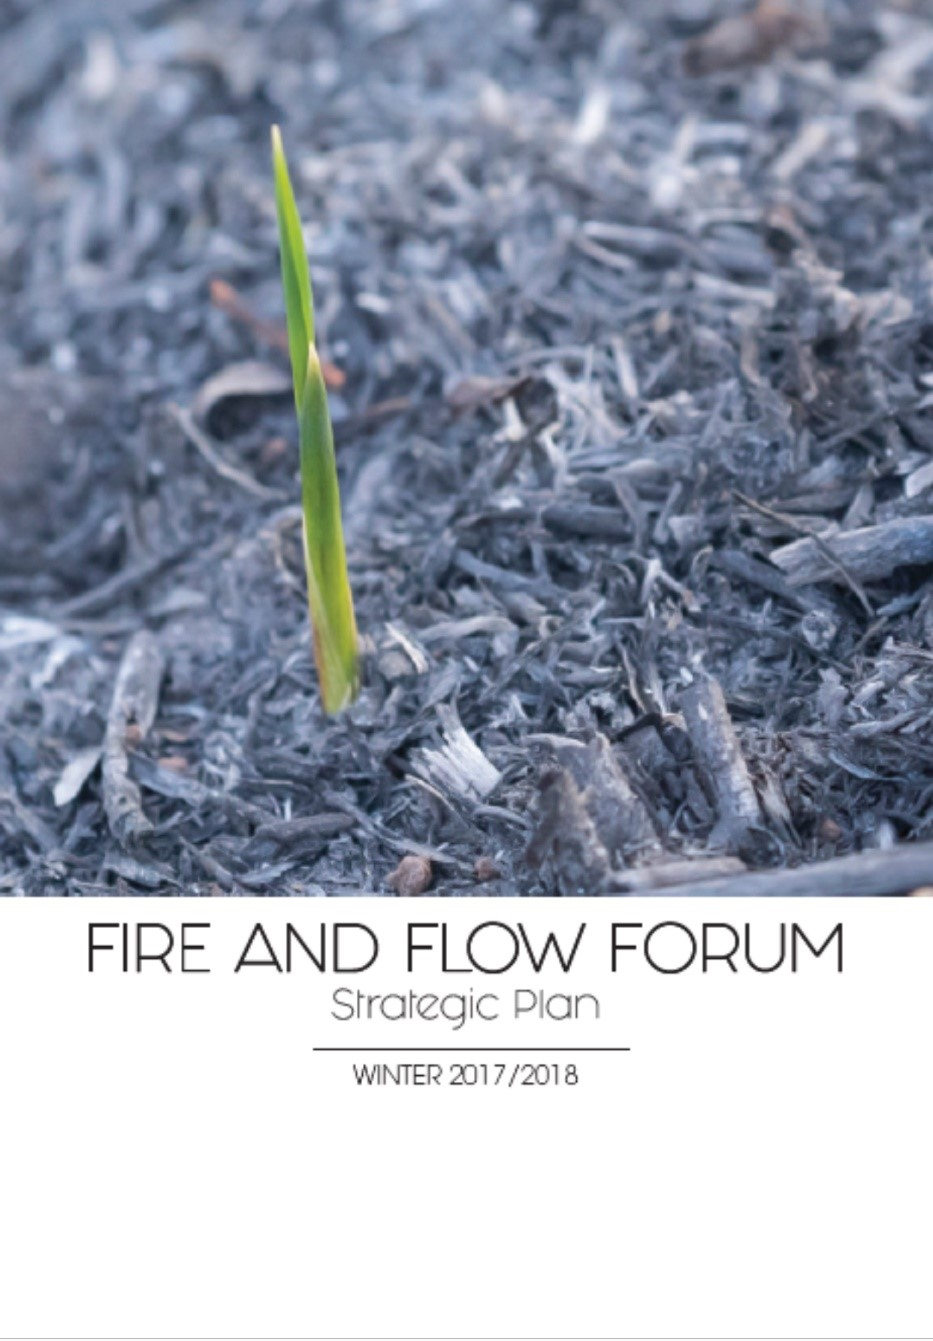 fireandflow